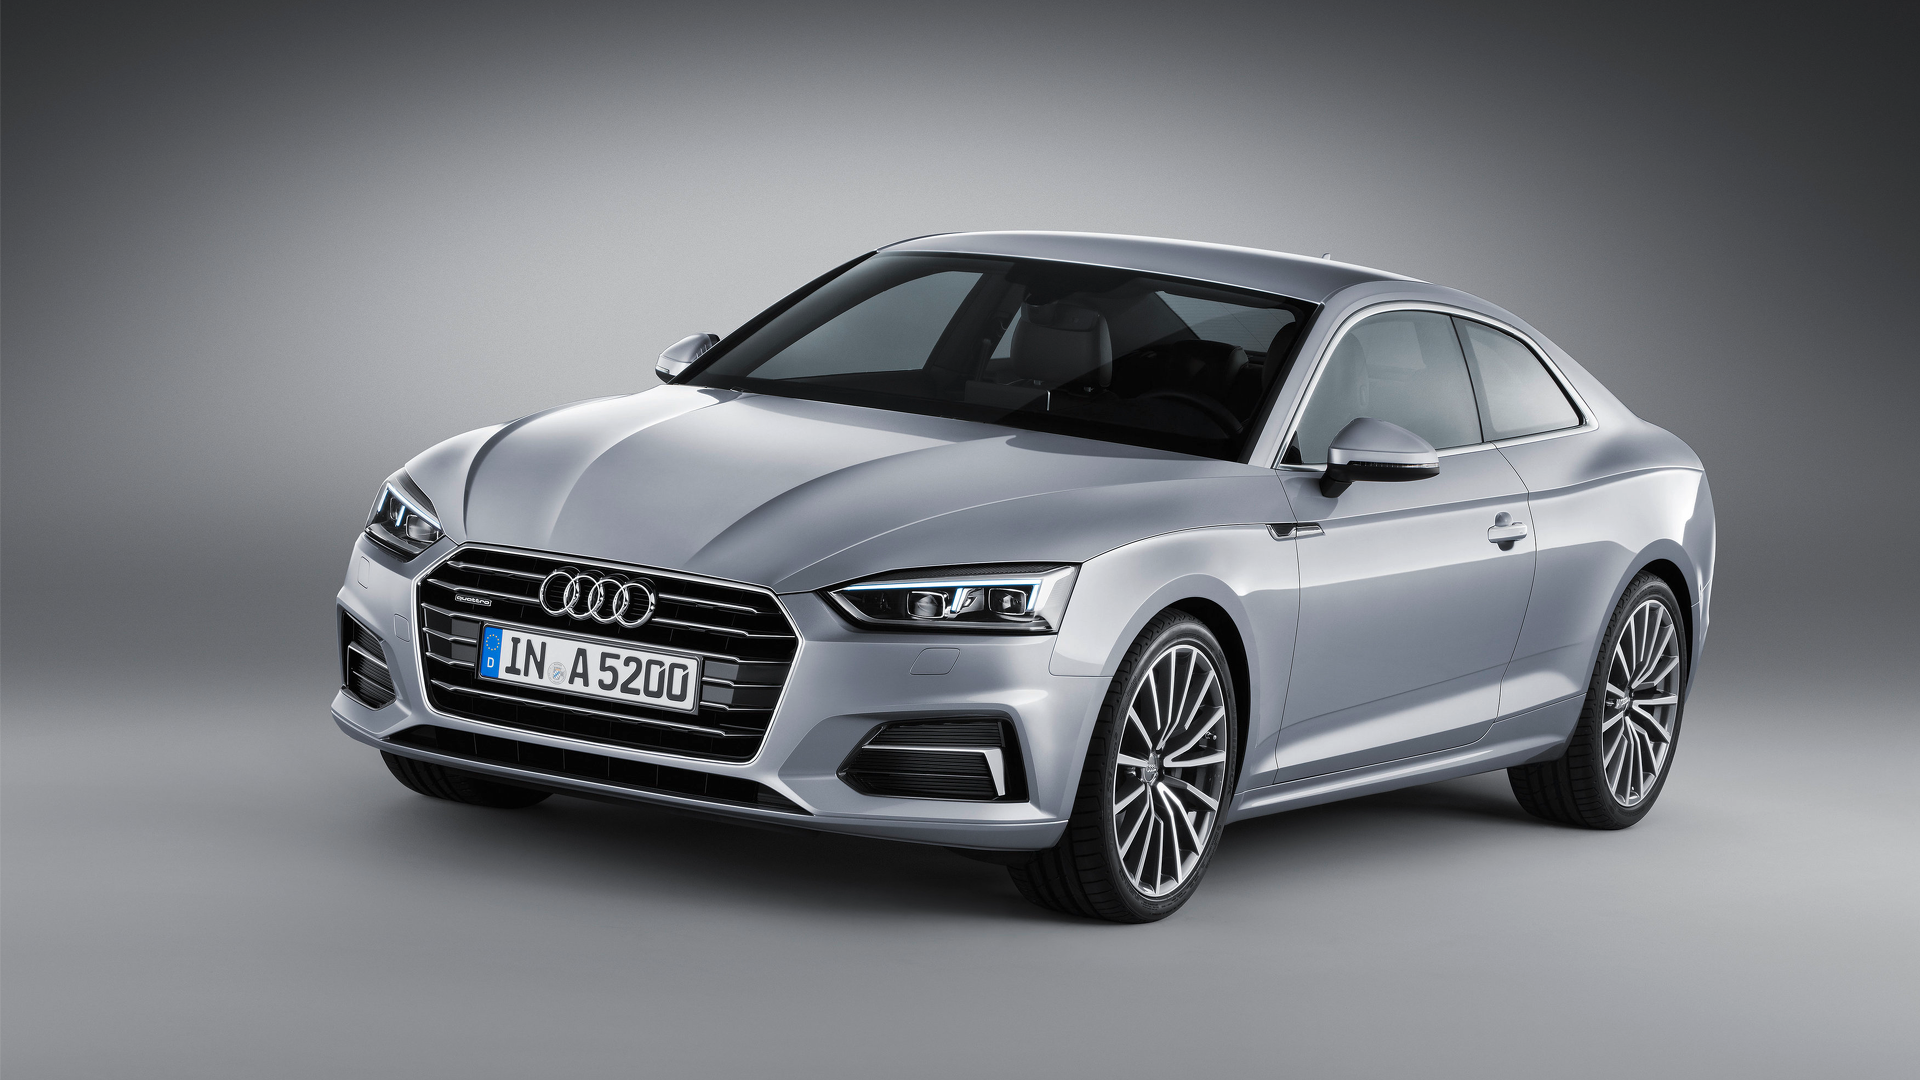 Performance Power Chip BOX Tuning to Audi A6 2.7 TDI C6 190HP UK